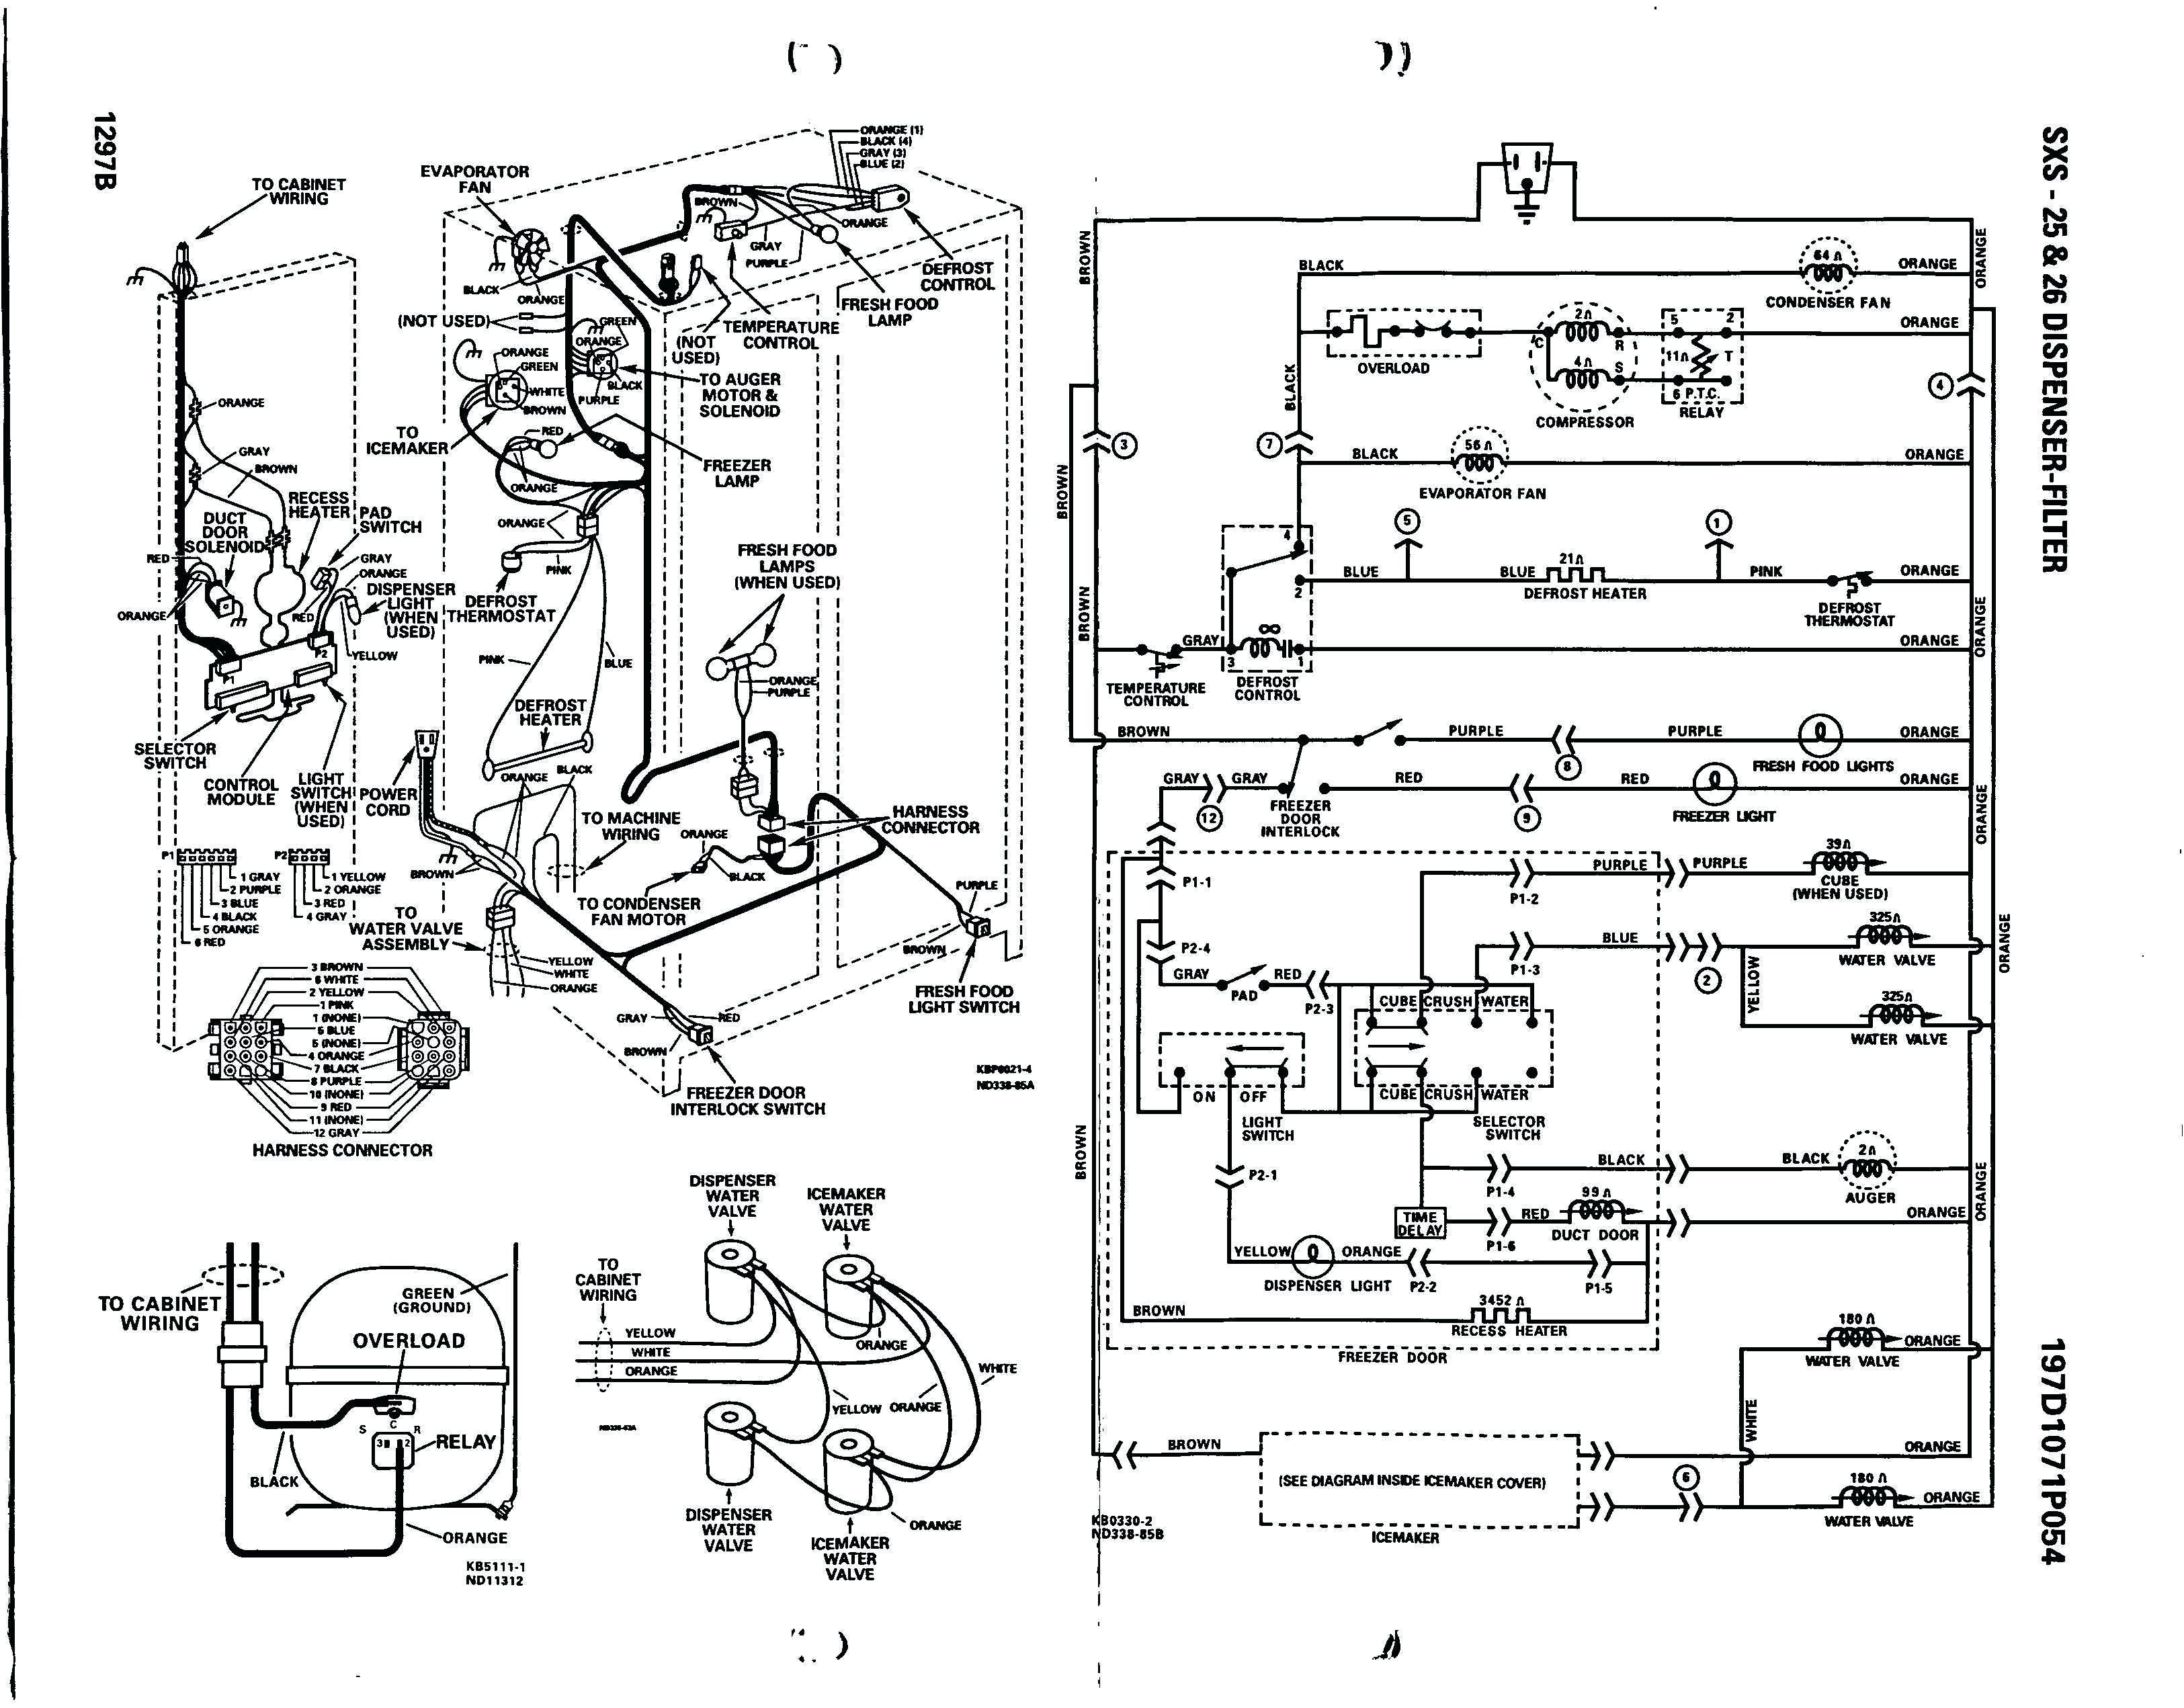 Automotive Air Conditioning Diagram Auto Air Conditioning Wiring Diagram Pdf Automotive Of Automotive Air Conditioning Diagram